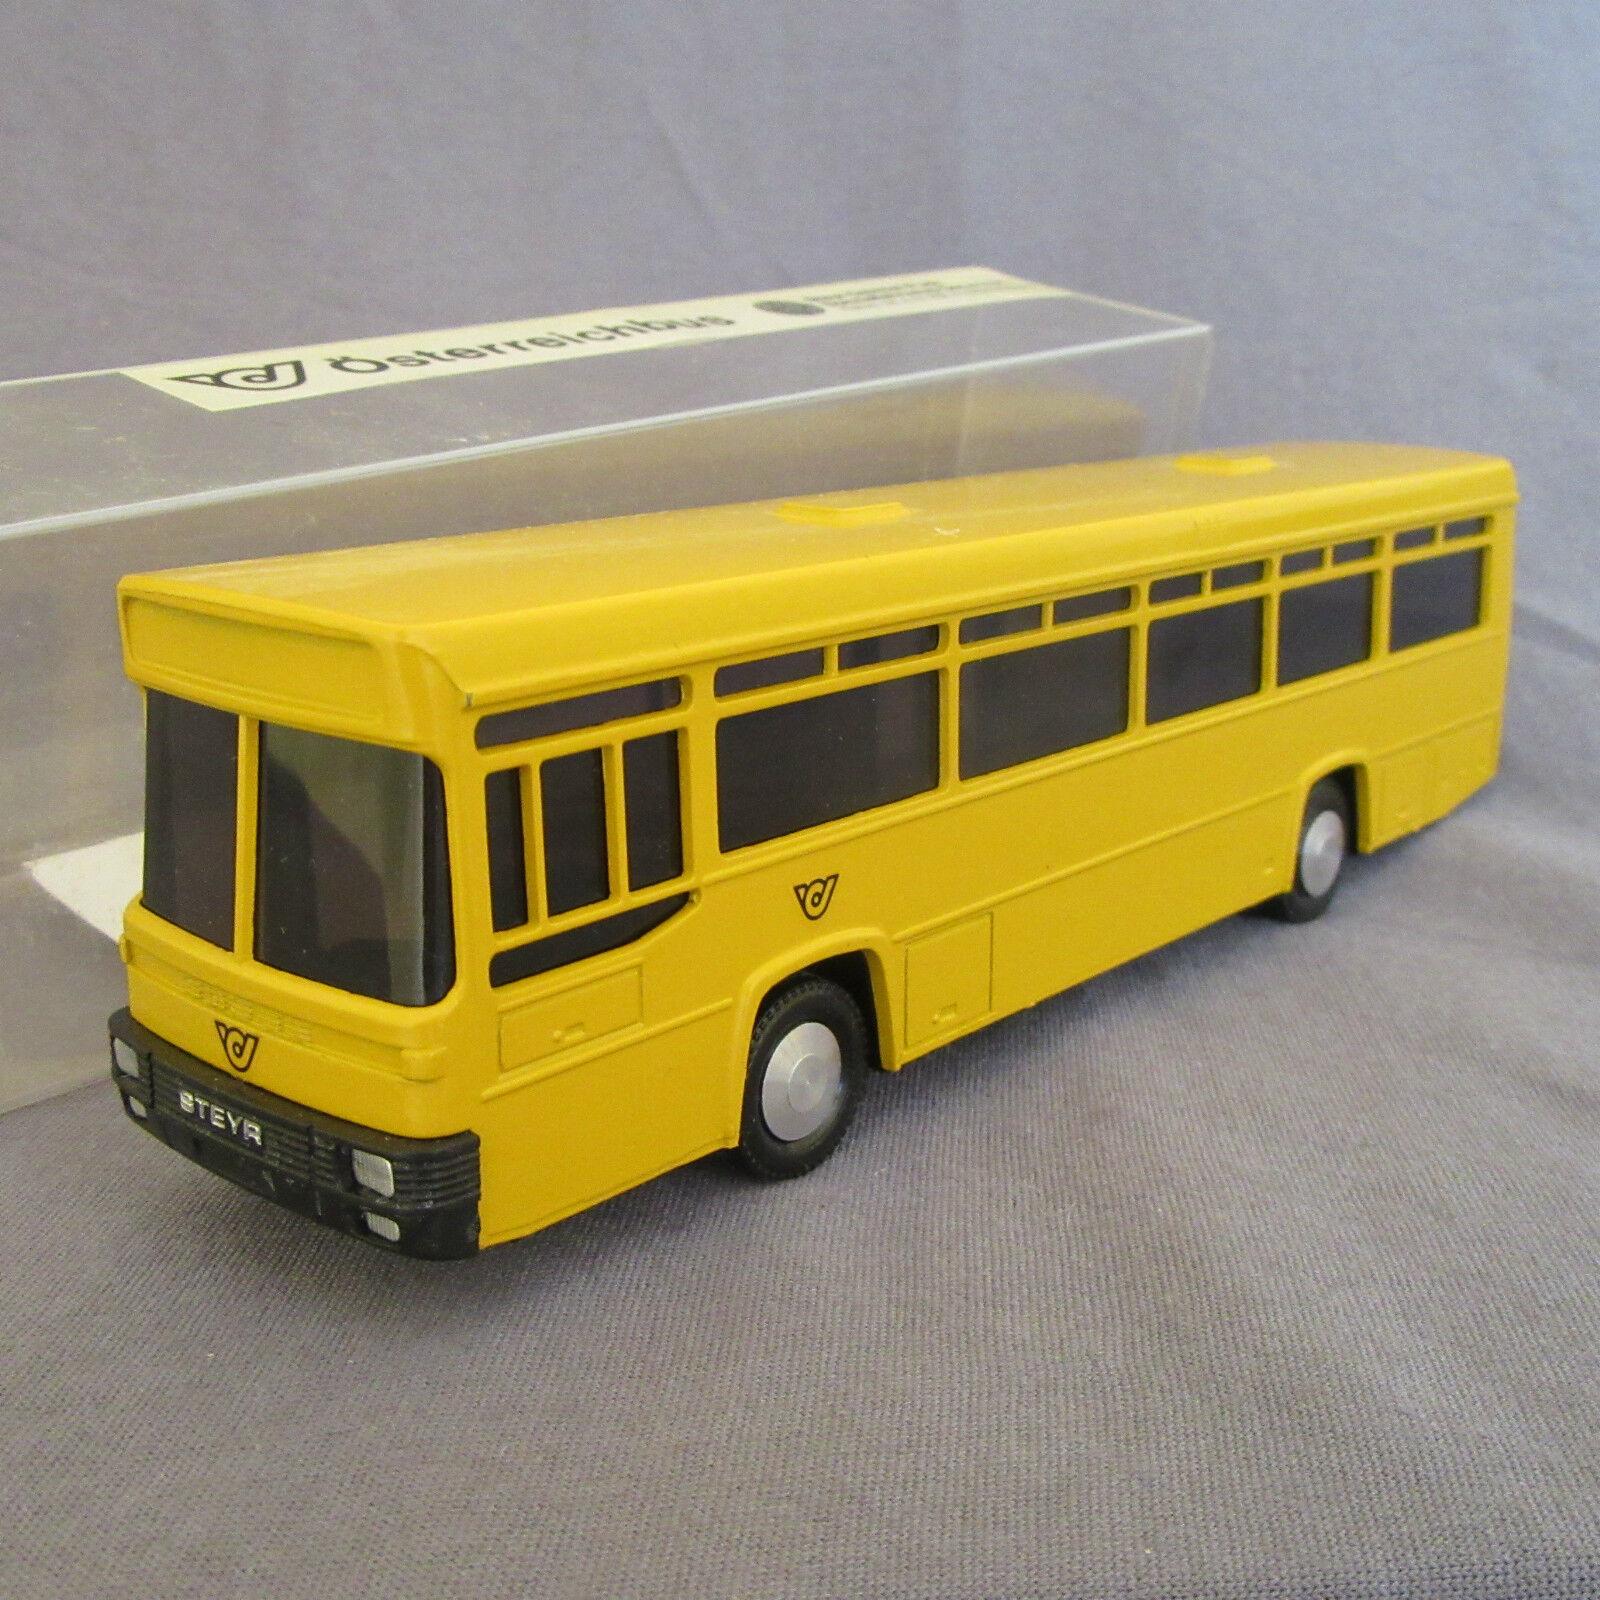 238E Cursor Modell 587 Bus Steyr Osterreichbus Yellow 1 66